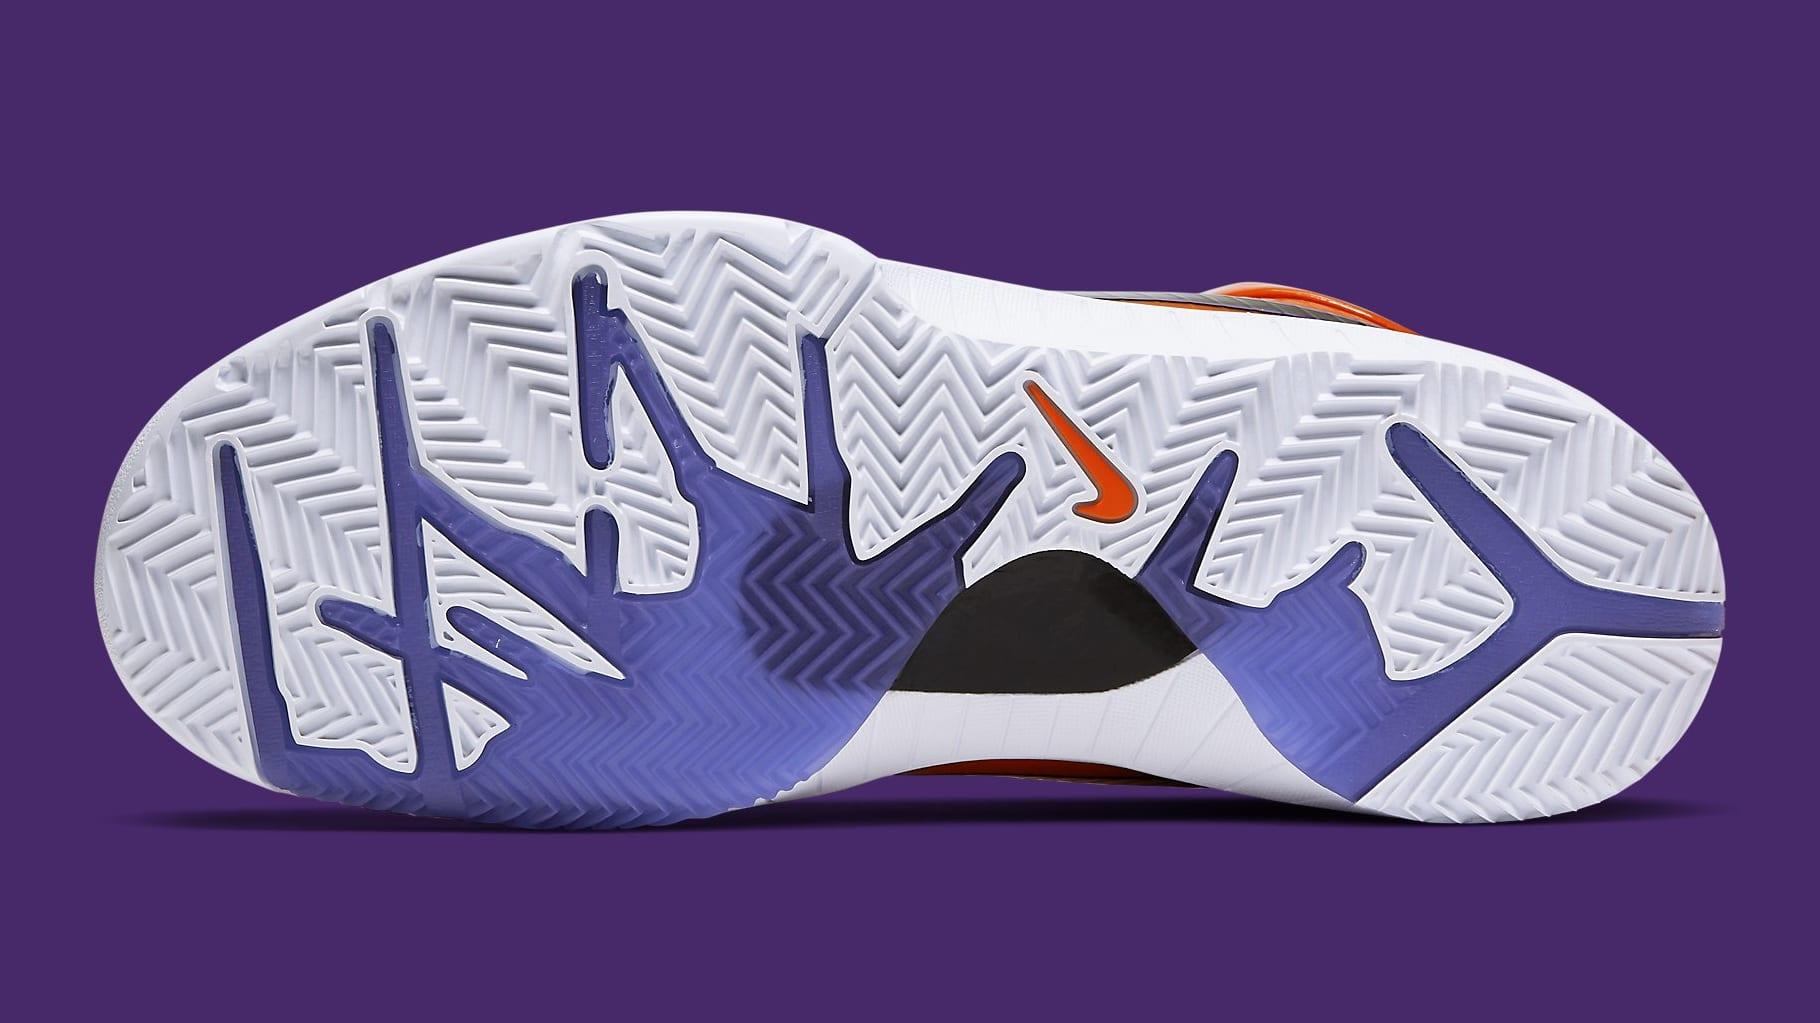 UNDFTD x Nike Kobe 4 Protro Orange Release Date CQ33869-800 Sole